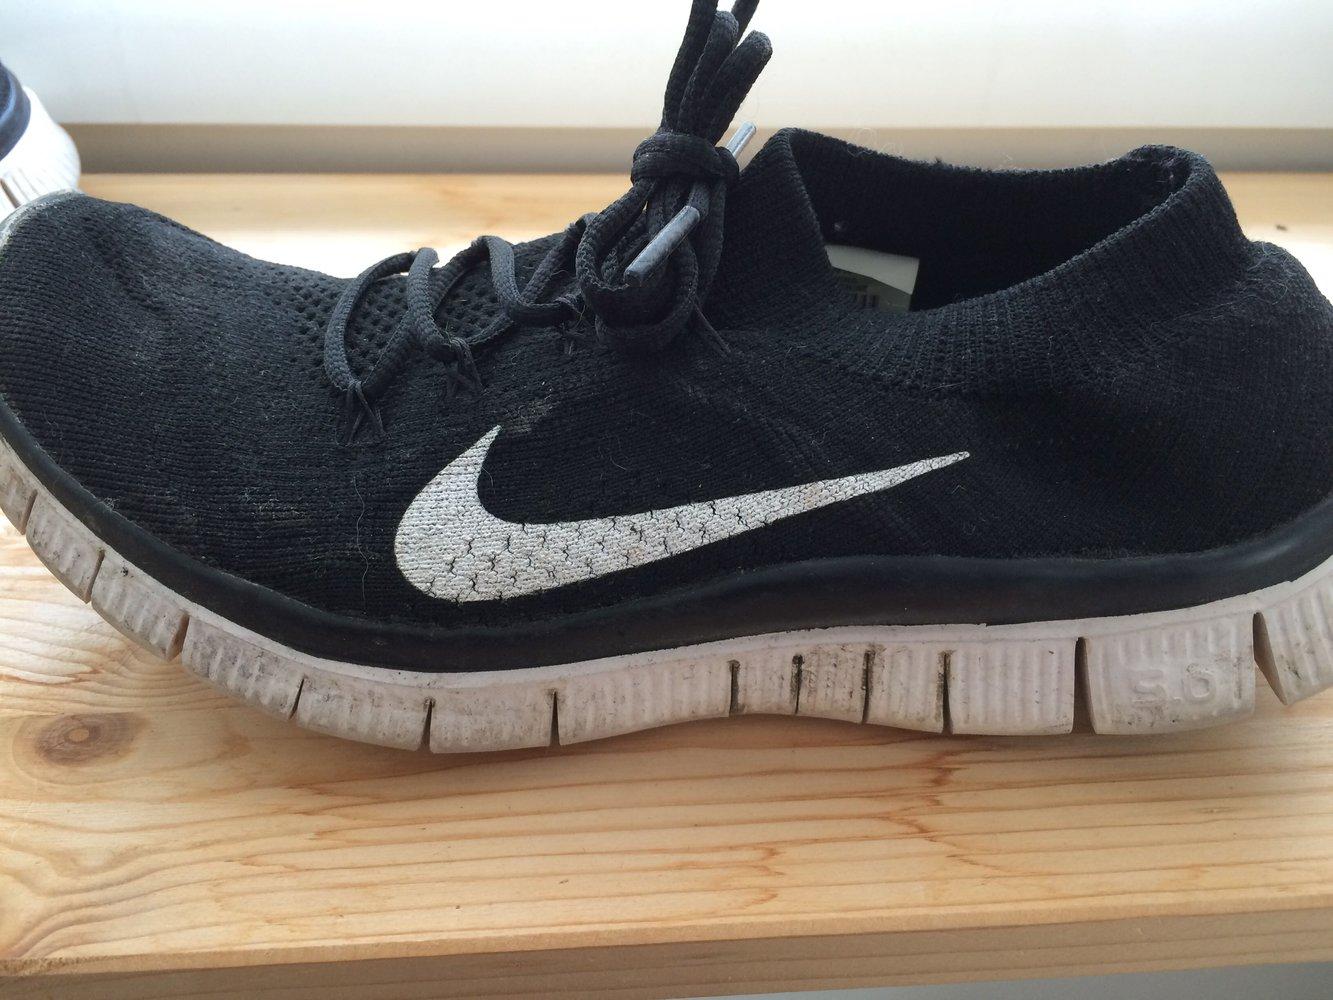 Nike Frees 5.0 mit Gummizug am Knöchel